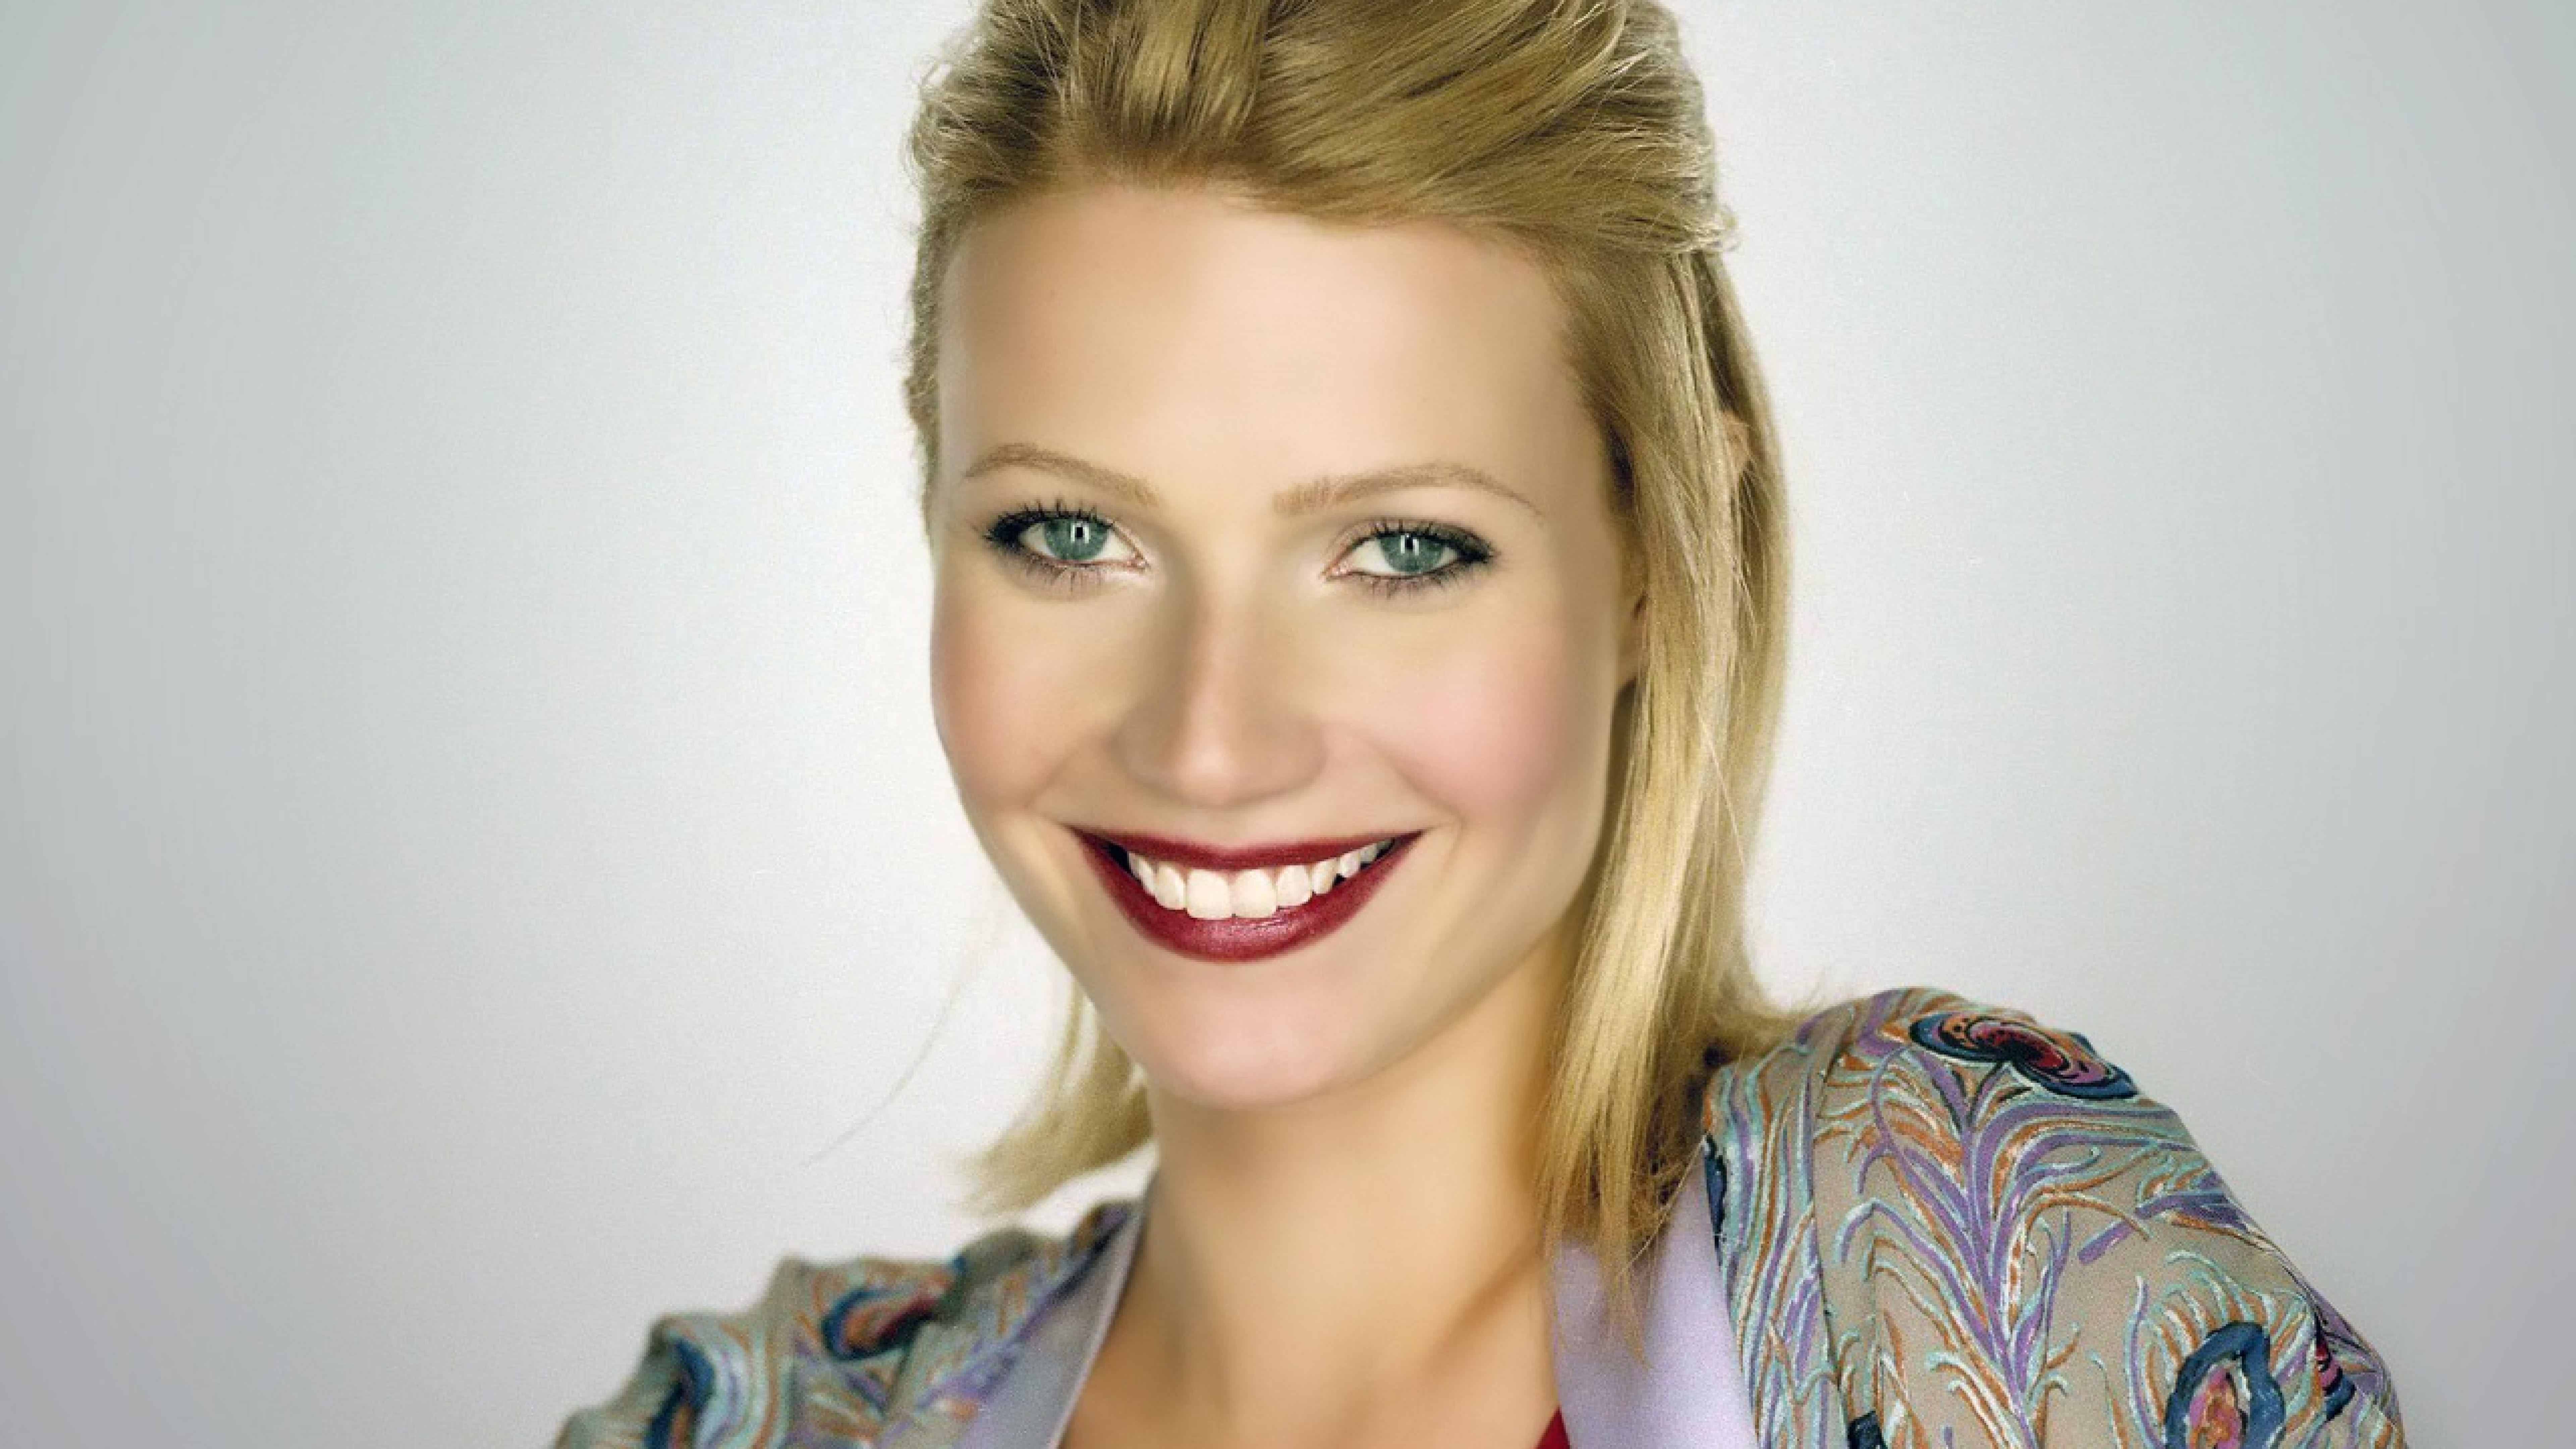 Gwyneth Paltrow Smile Photoshoot Hd Wallpaper